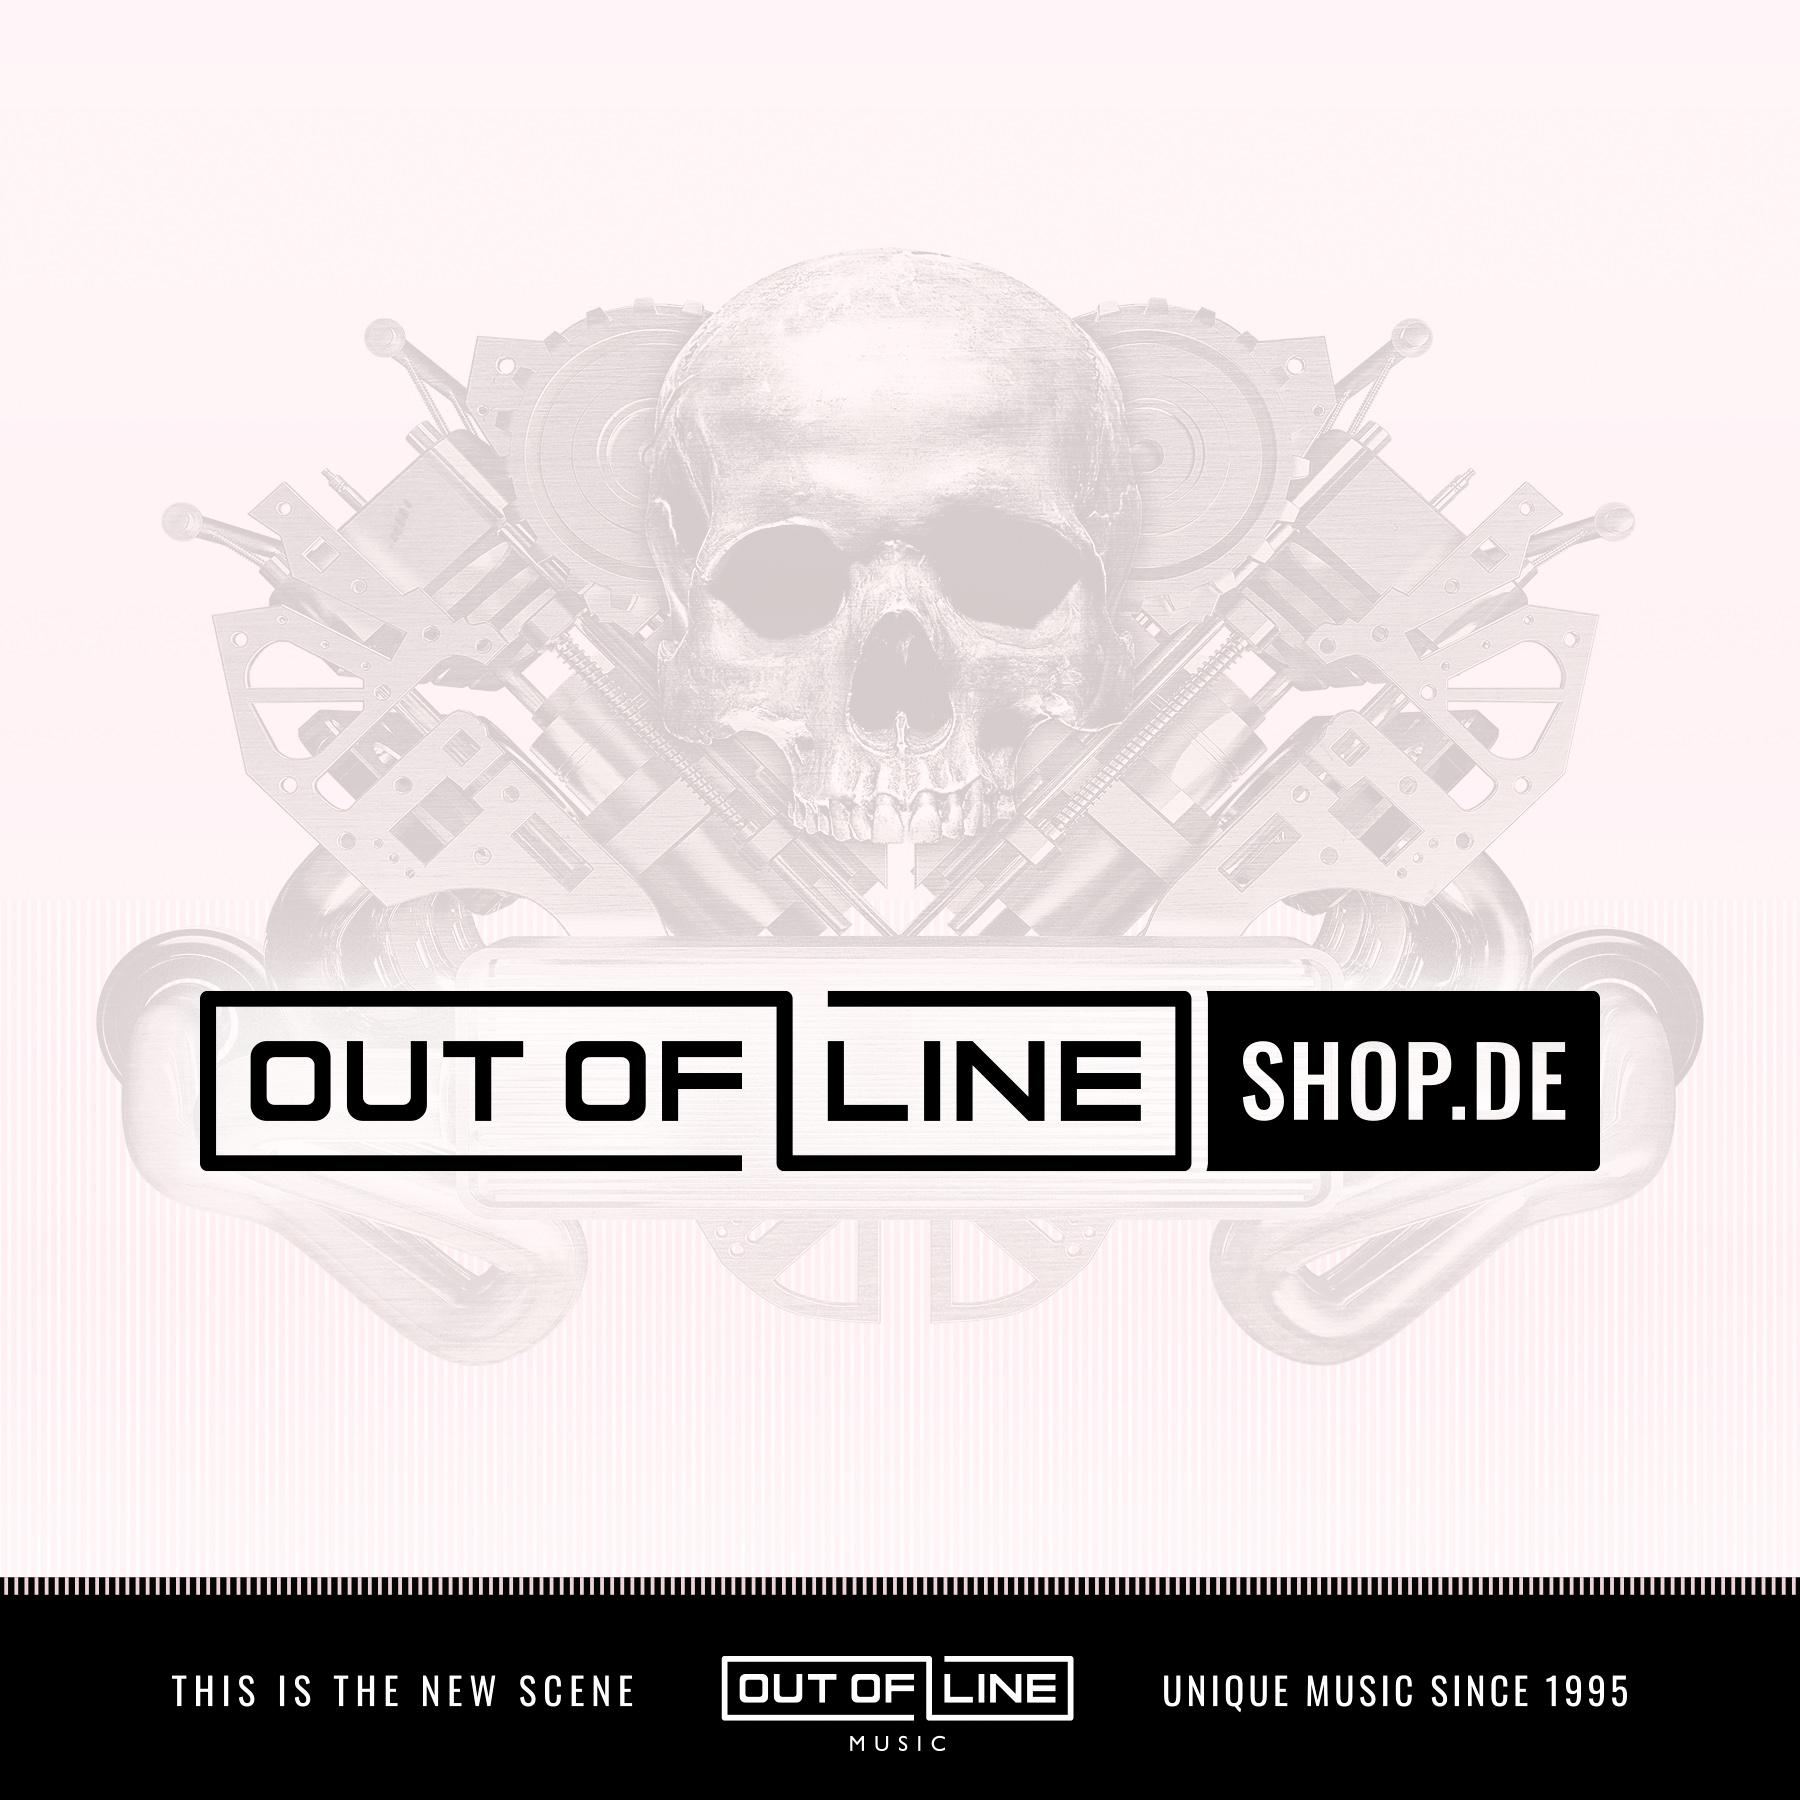 Xymox - Twist Of Shadows (Deluxe) - 2CD